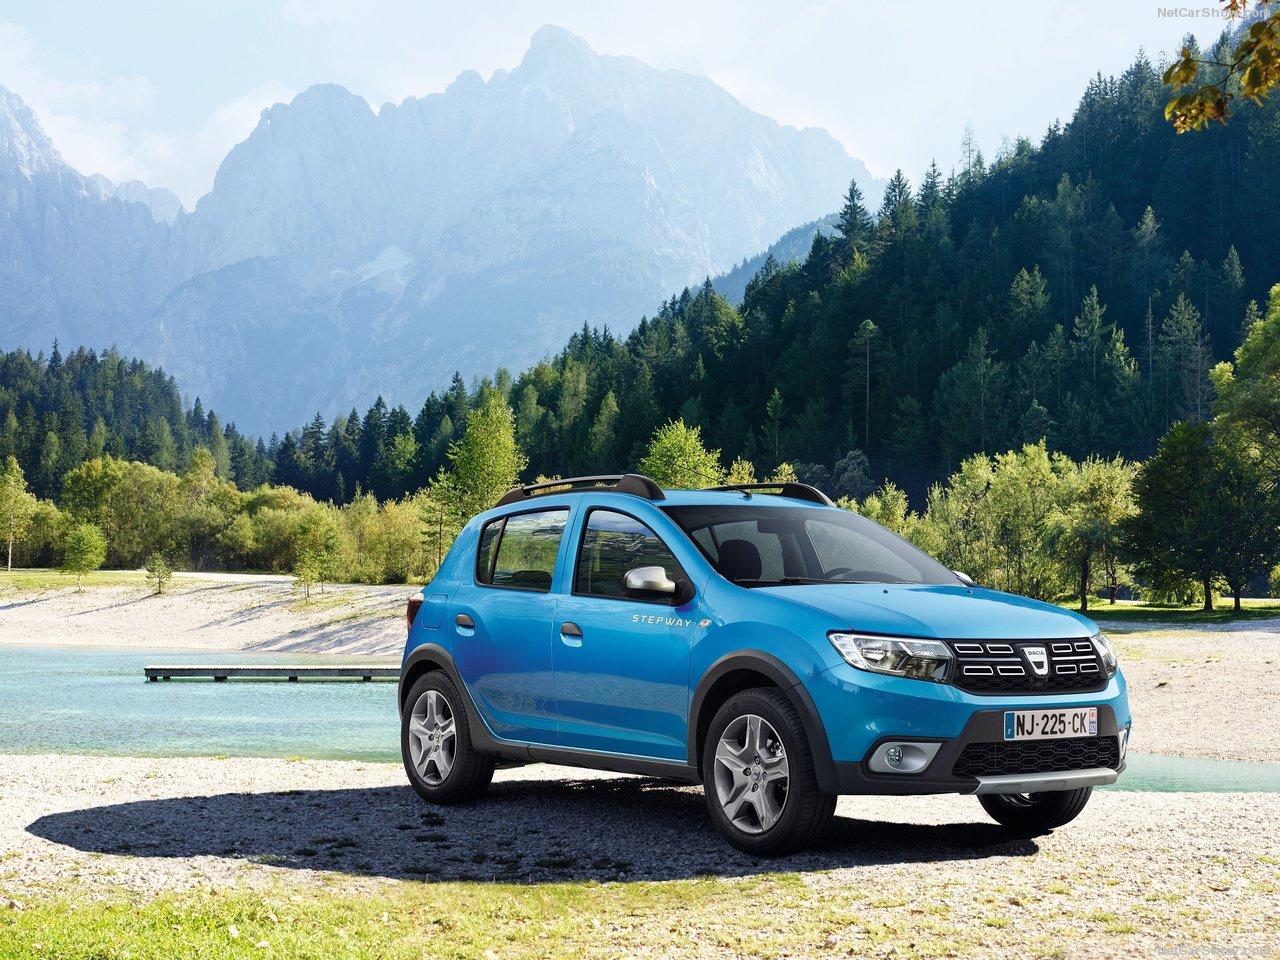 Renault Sandero Stepway 2018 - комплектации, цены, фото и характеристики